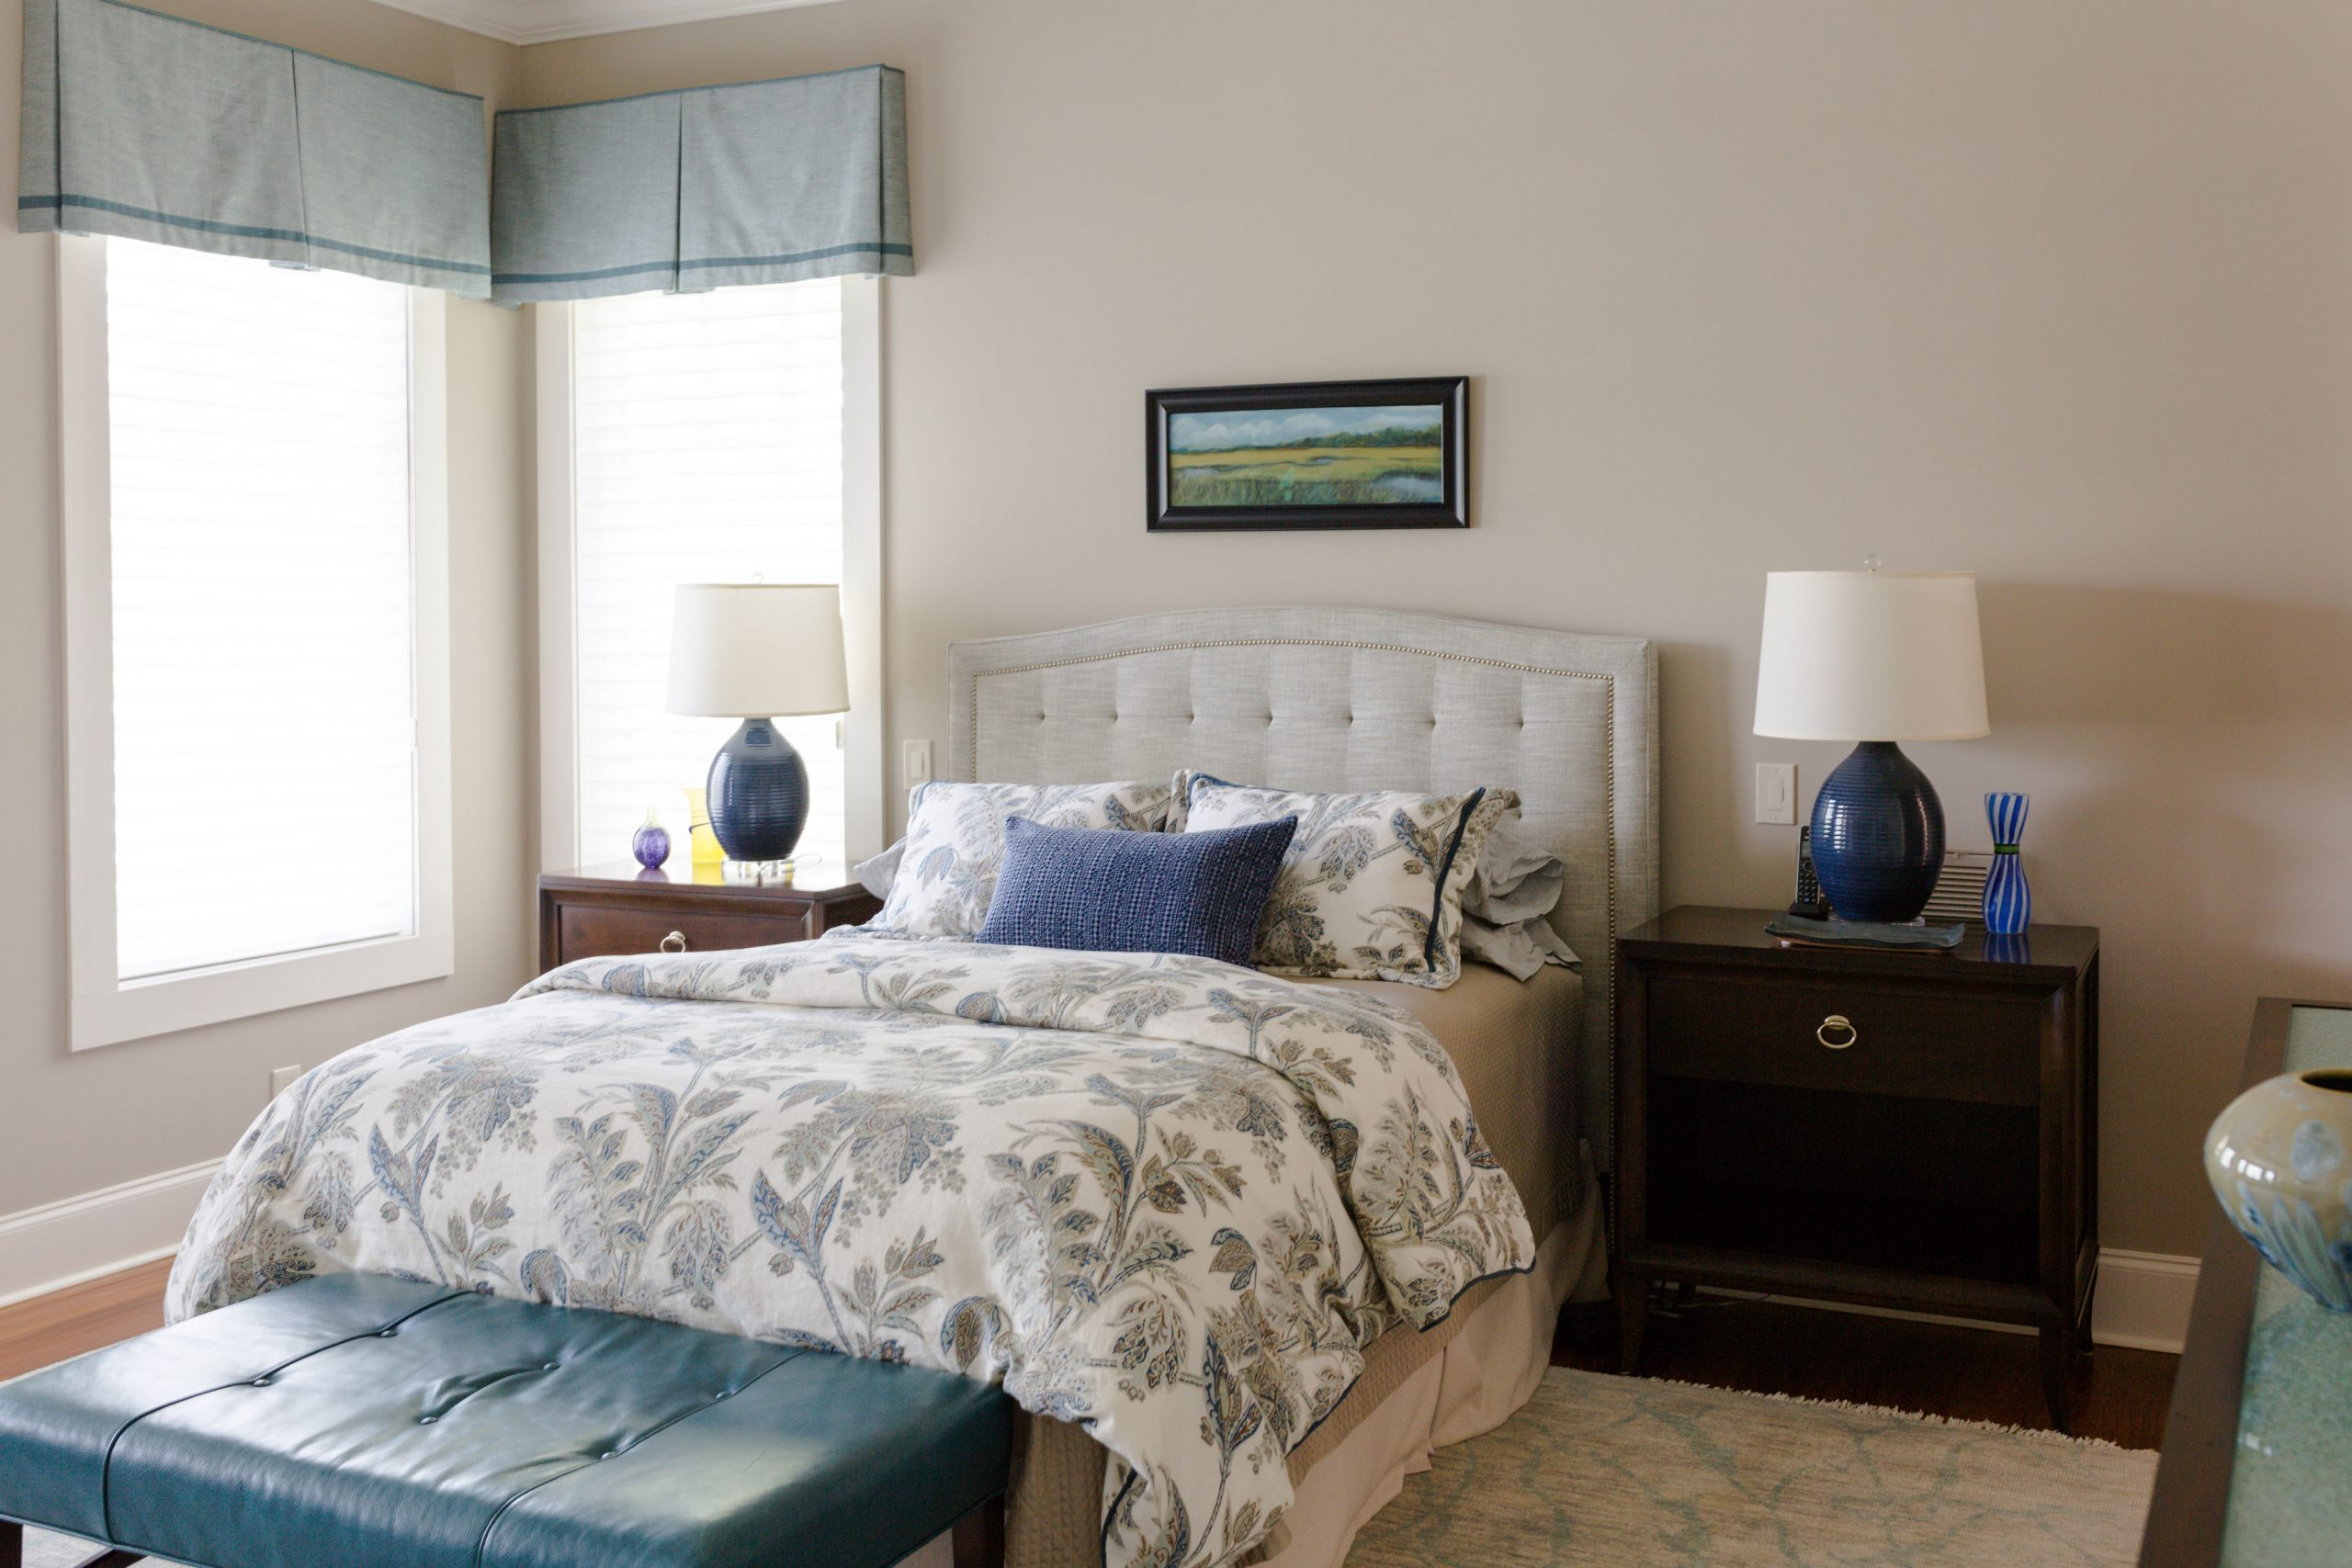 Thompson custom bedding and valances